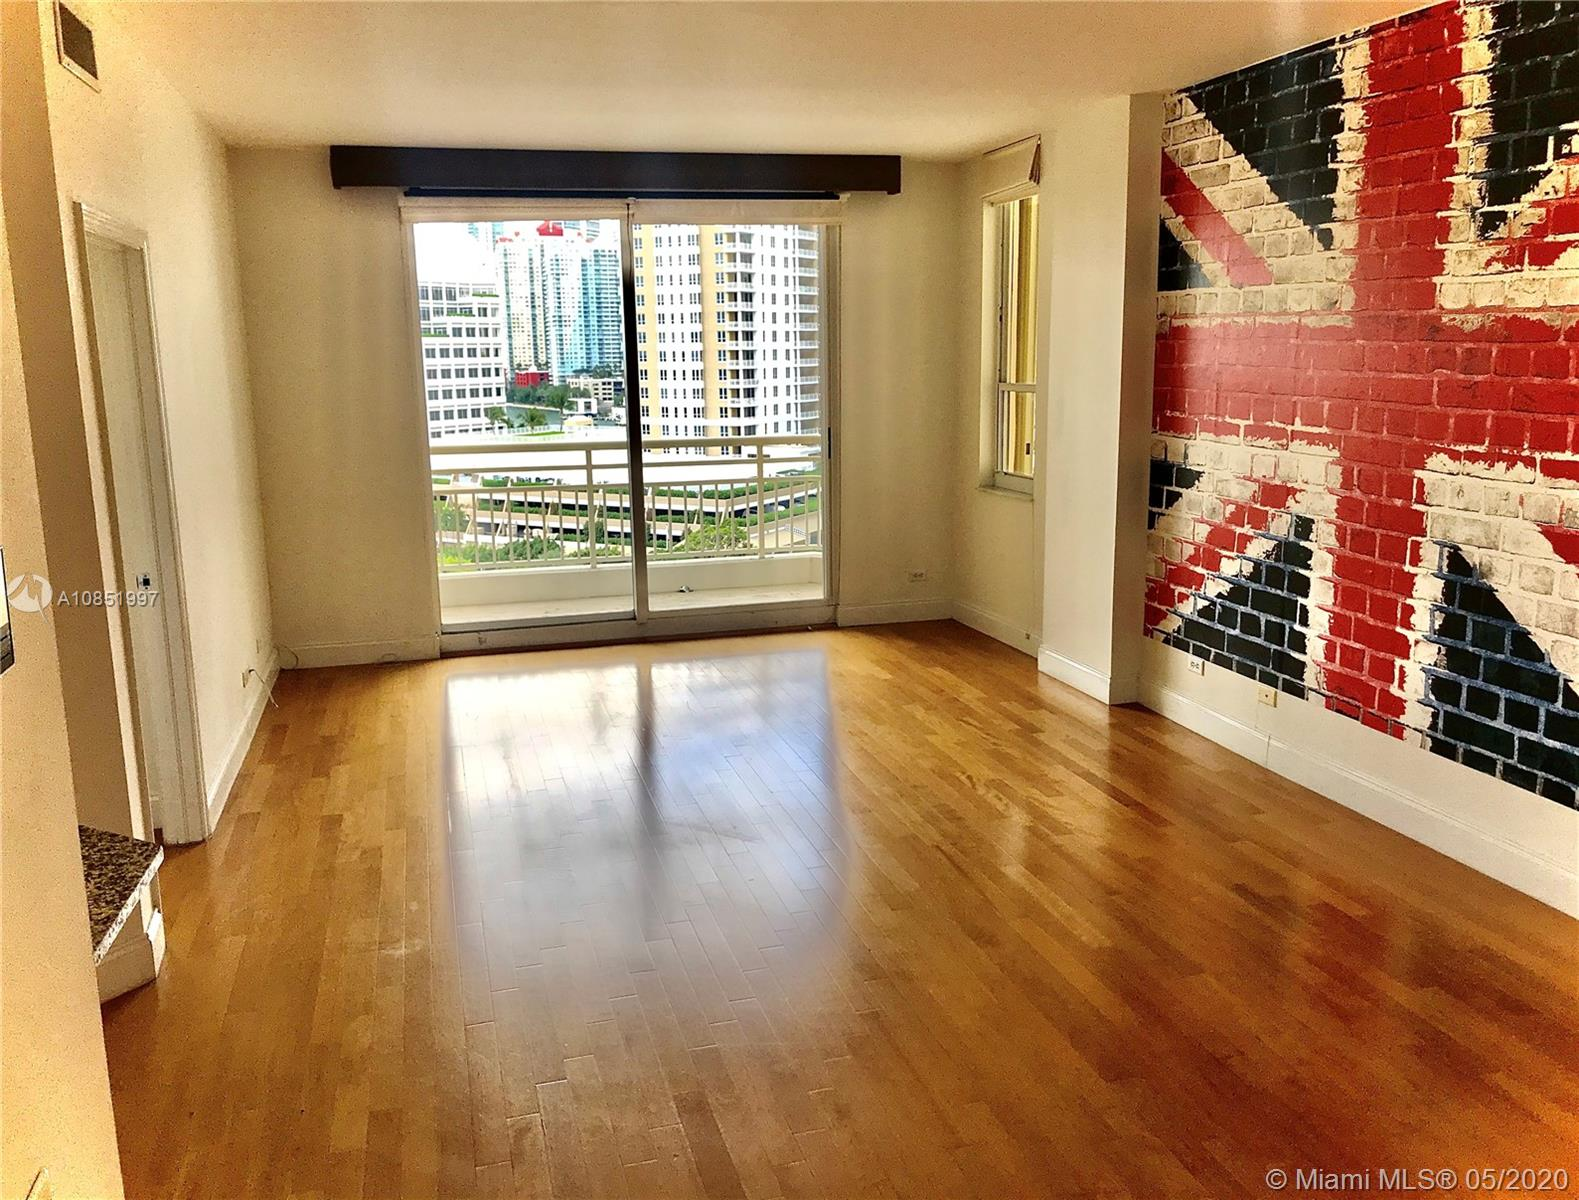 888 Brickell Key Dr # 1102, Miami, Florida 33131, 1 Bedroom Bedrooms, ,2 BathroomsBathrooms,Residential,For Sale,888 Brickell Key Dr # 1102,A10851997